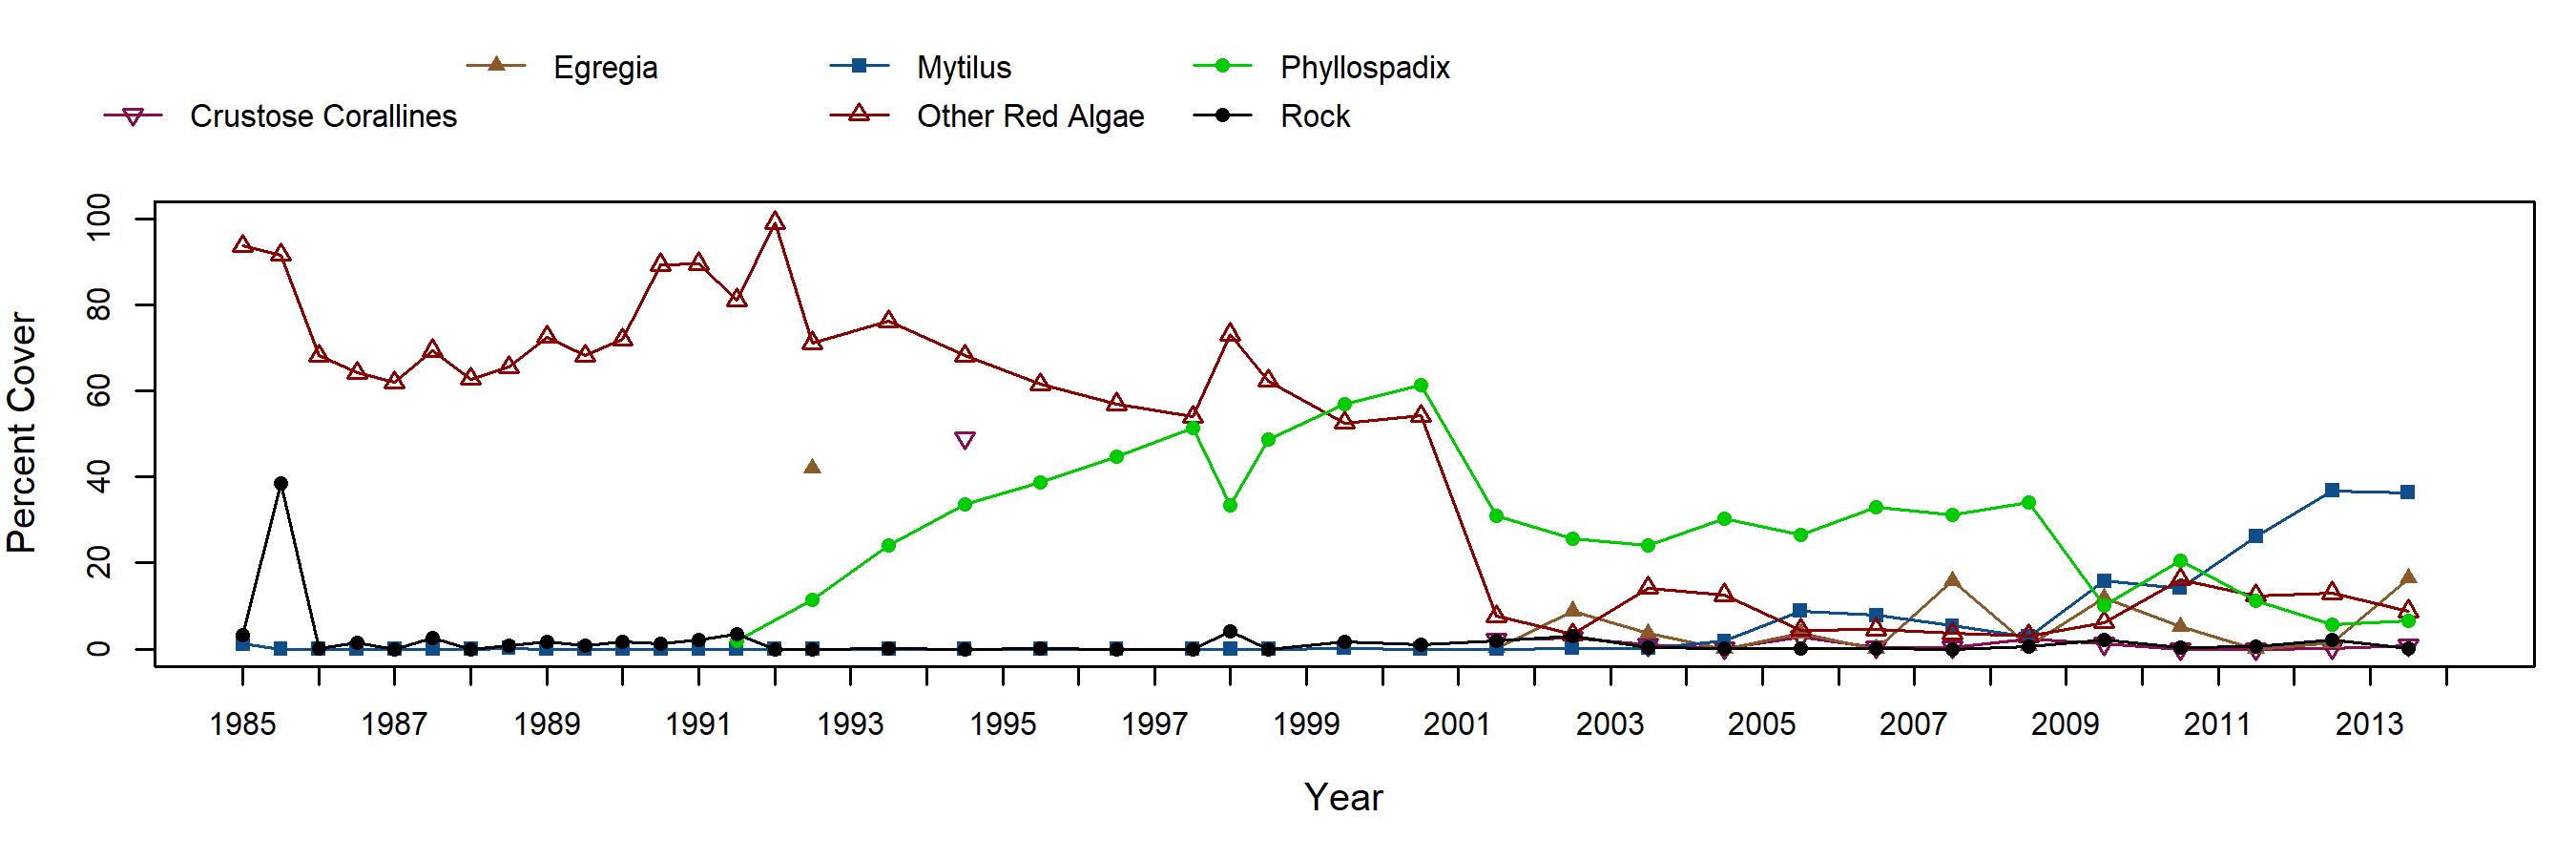 Landing Cove red algae trend plot